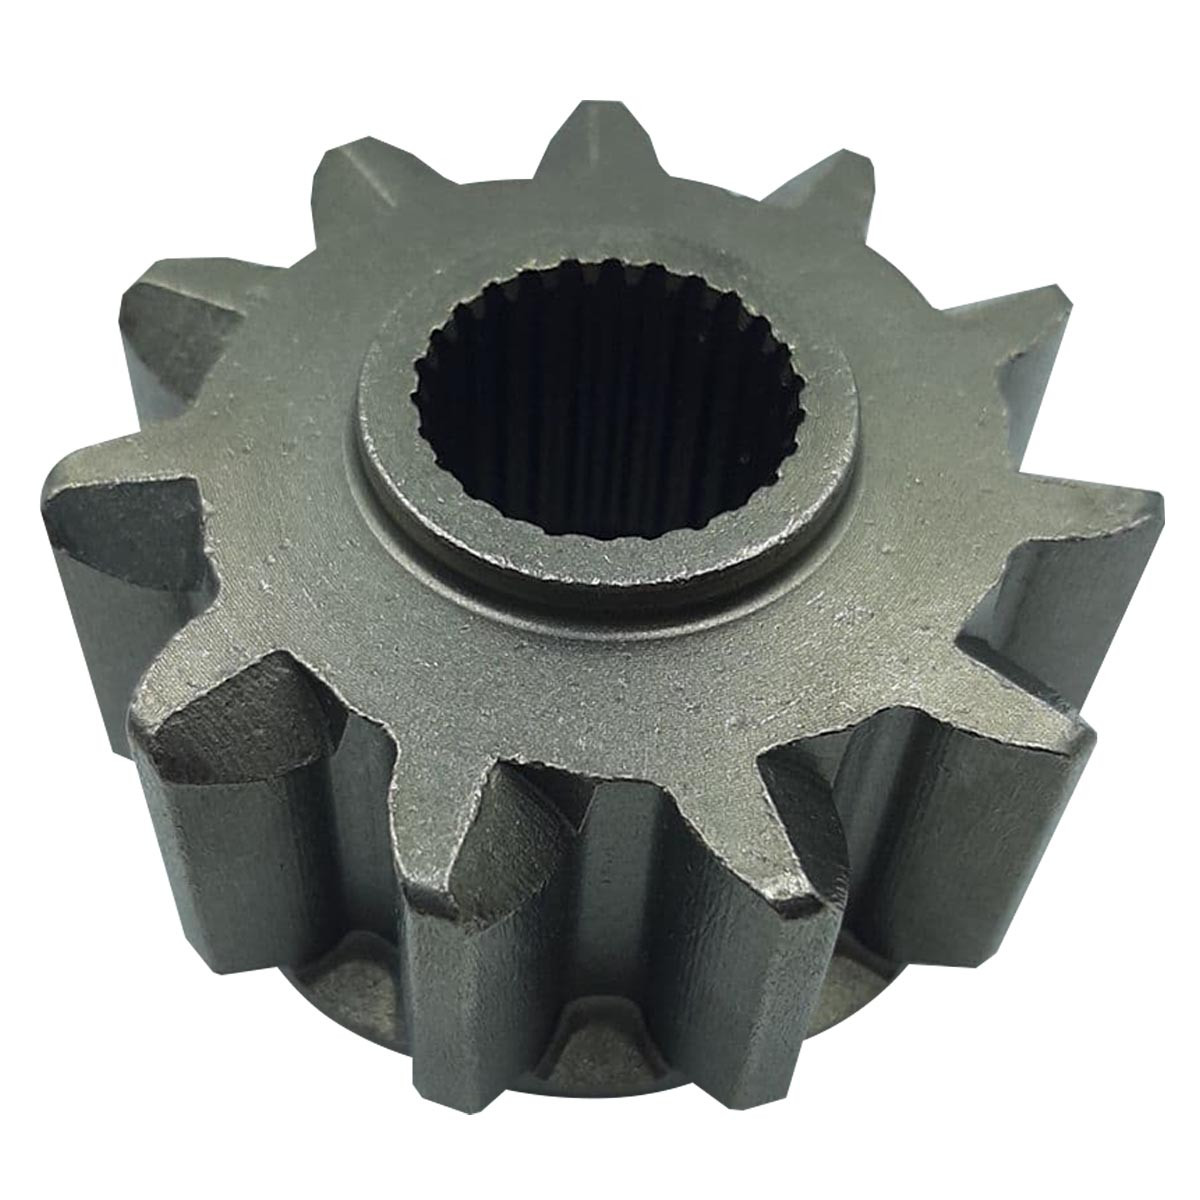 07-2481307 Шестерня приводу стартера z=11;D=57.5 mm (ТМ JFD) (SMD)